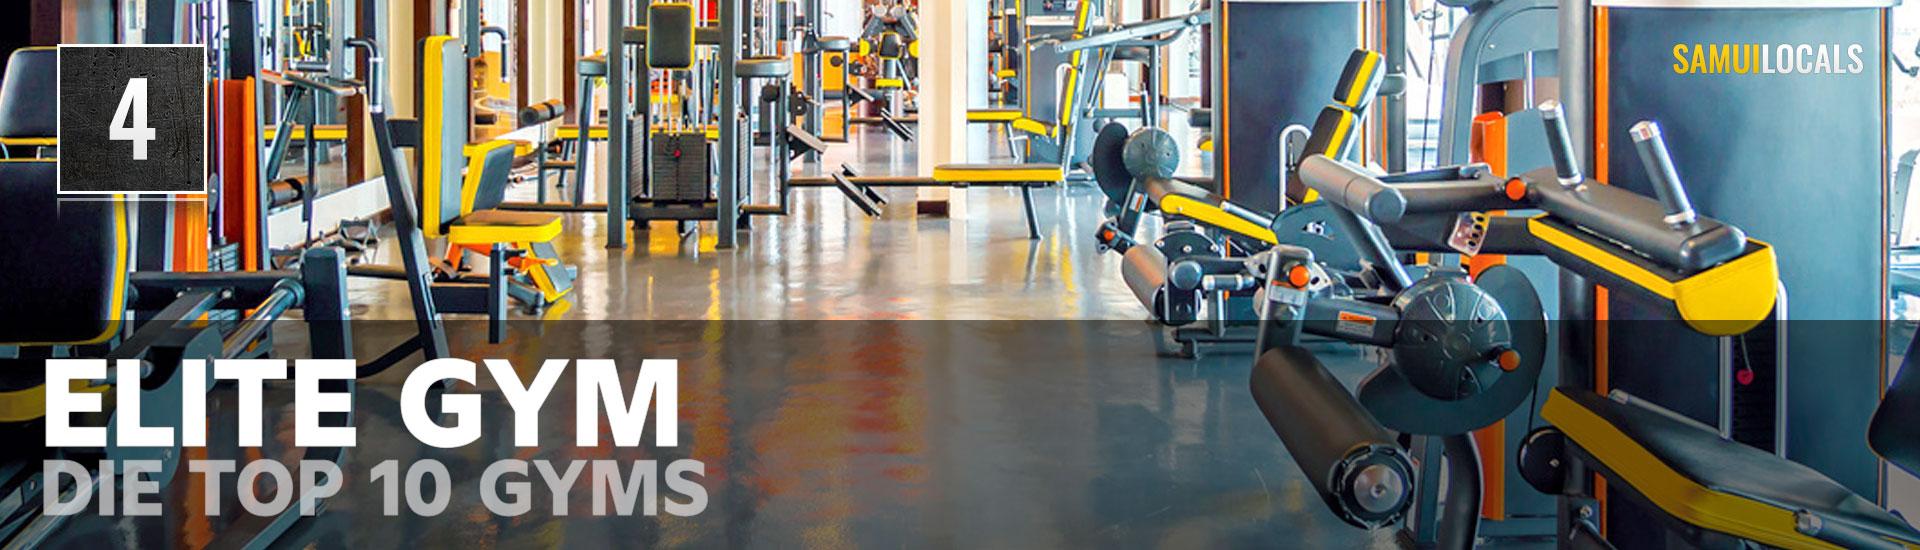 Top_10_gyms_elite_gym